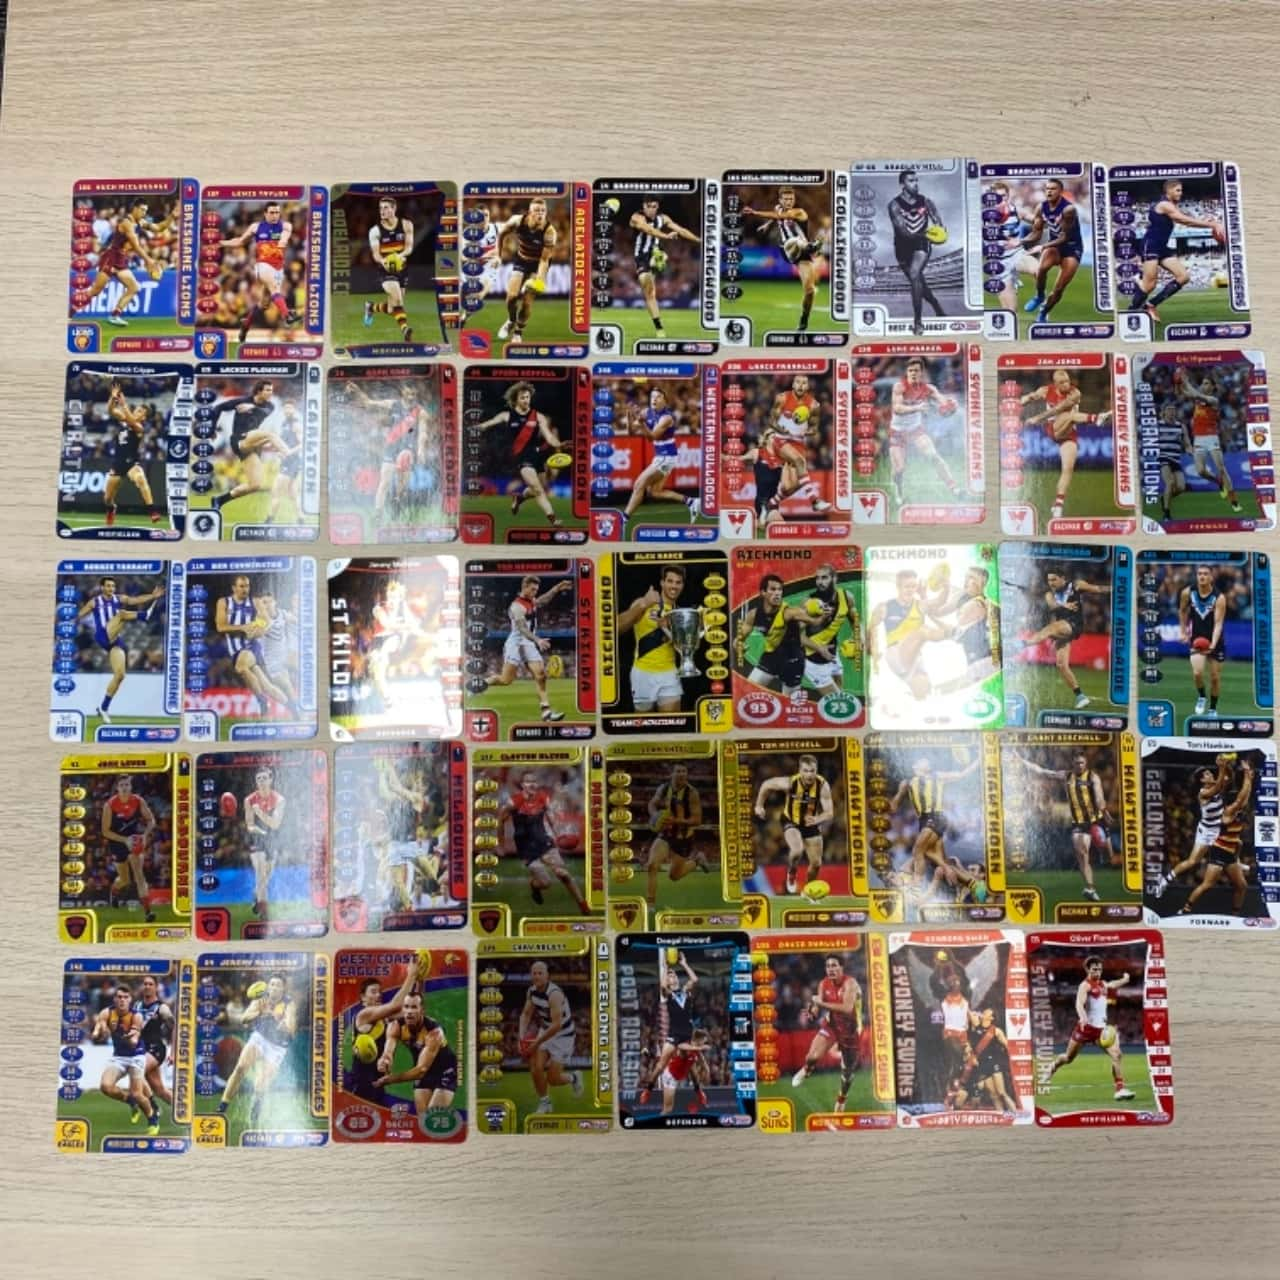 AFL Footy Cards